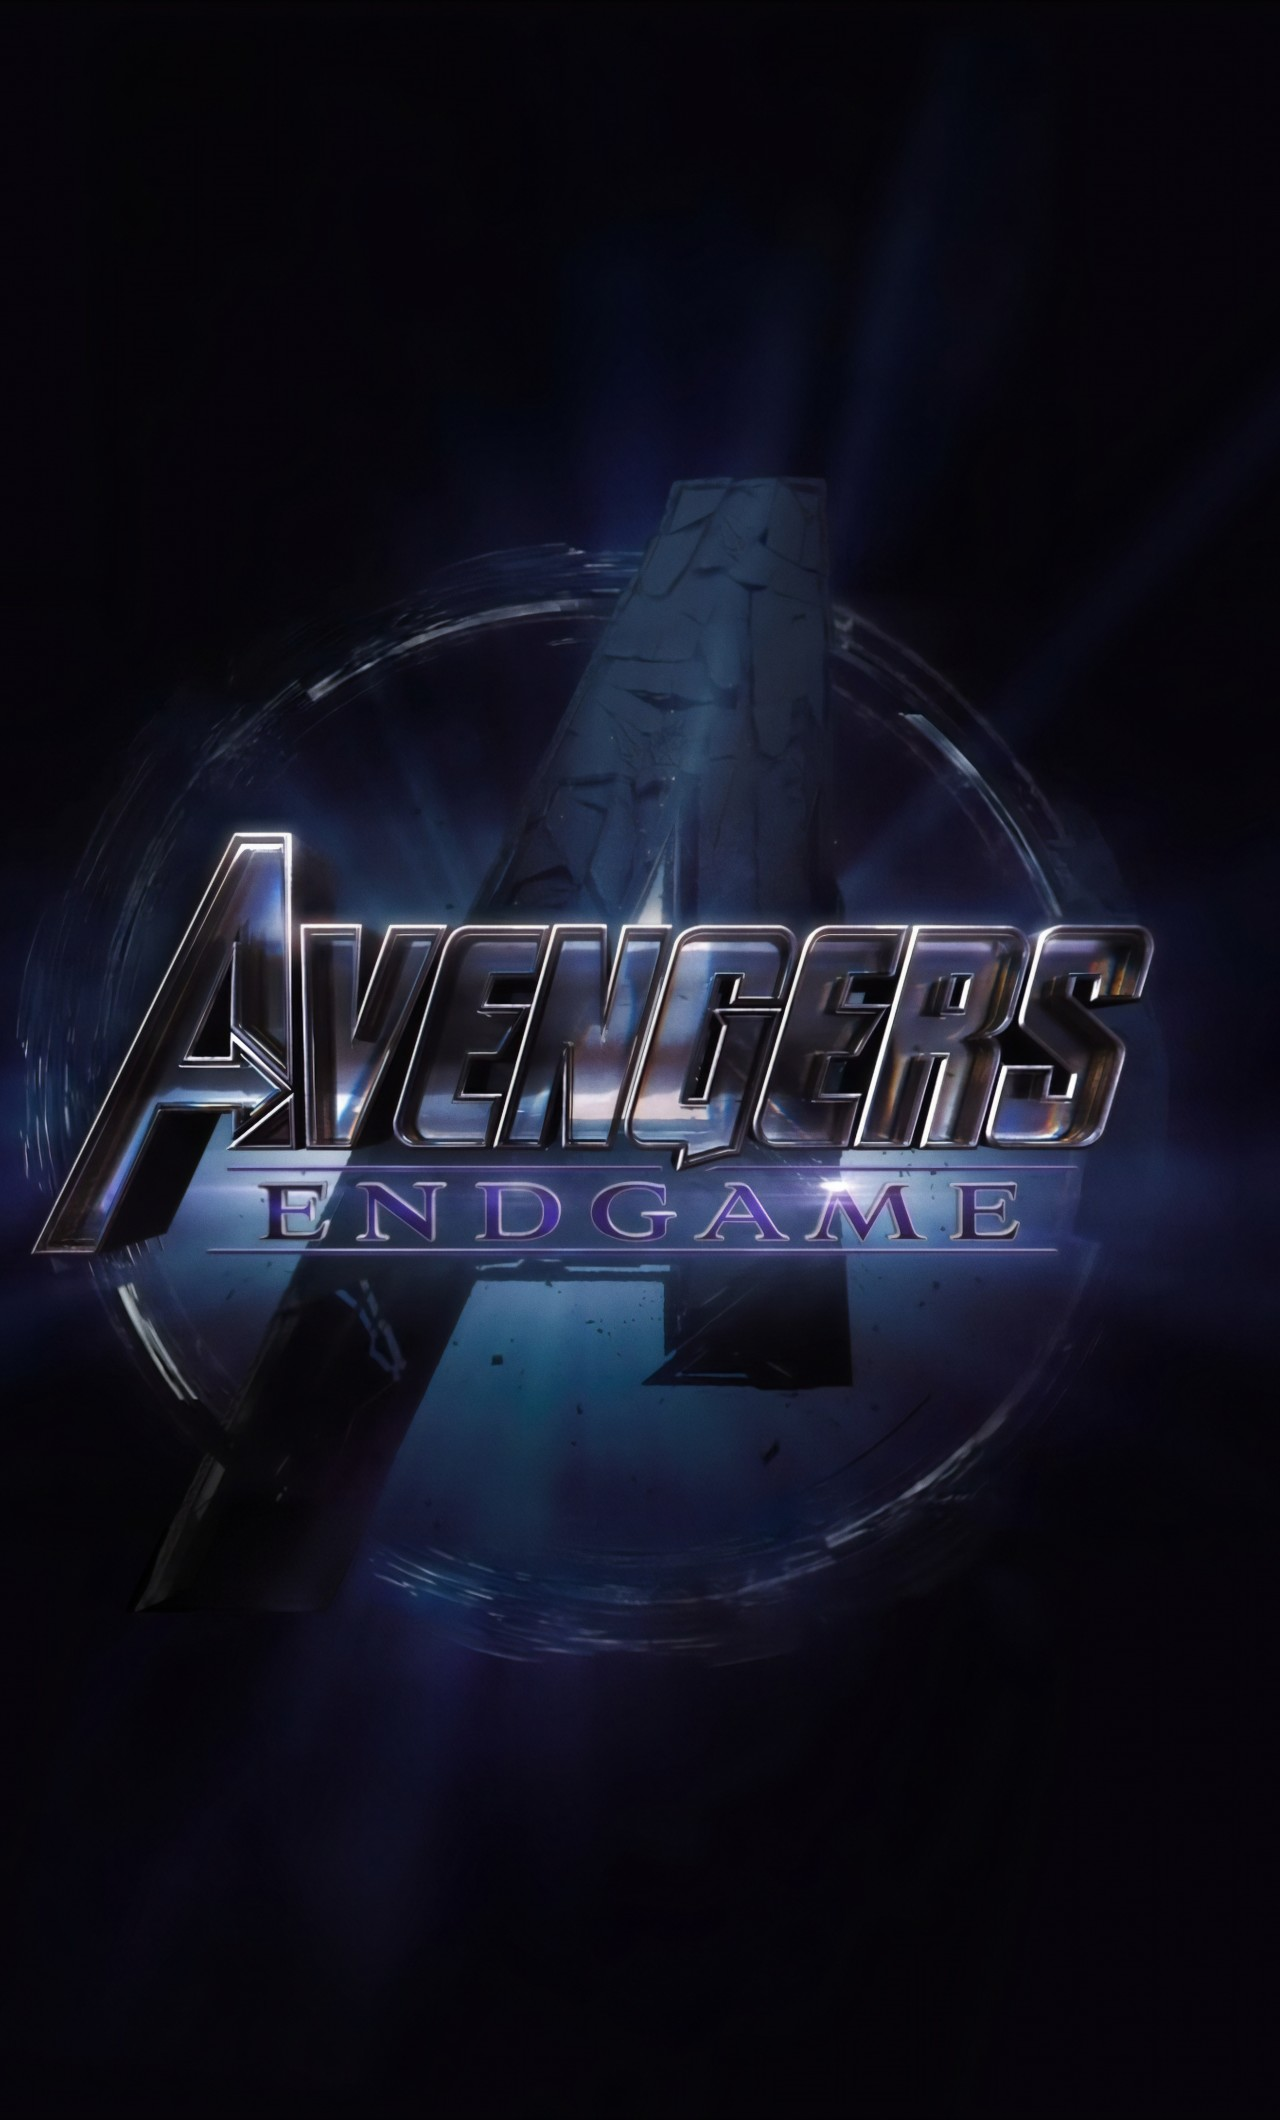 1280x2120 Avengers 4 Endgame Poster iPhone 6 plus ...